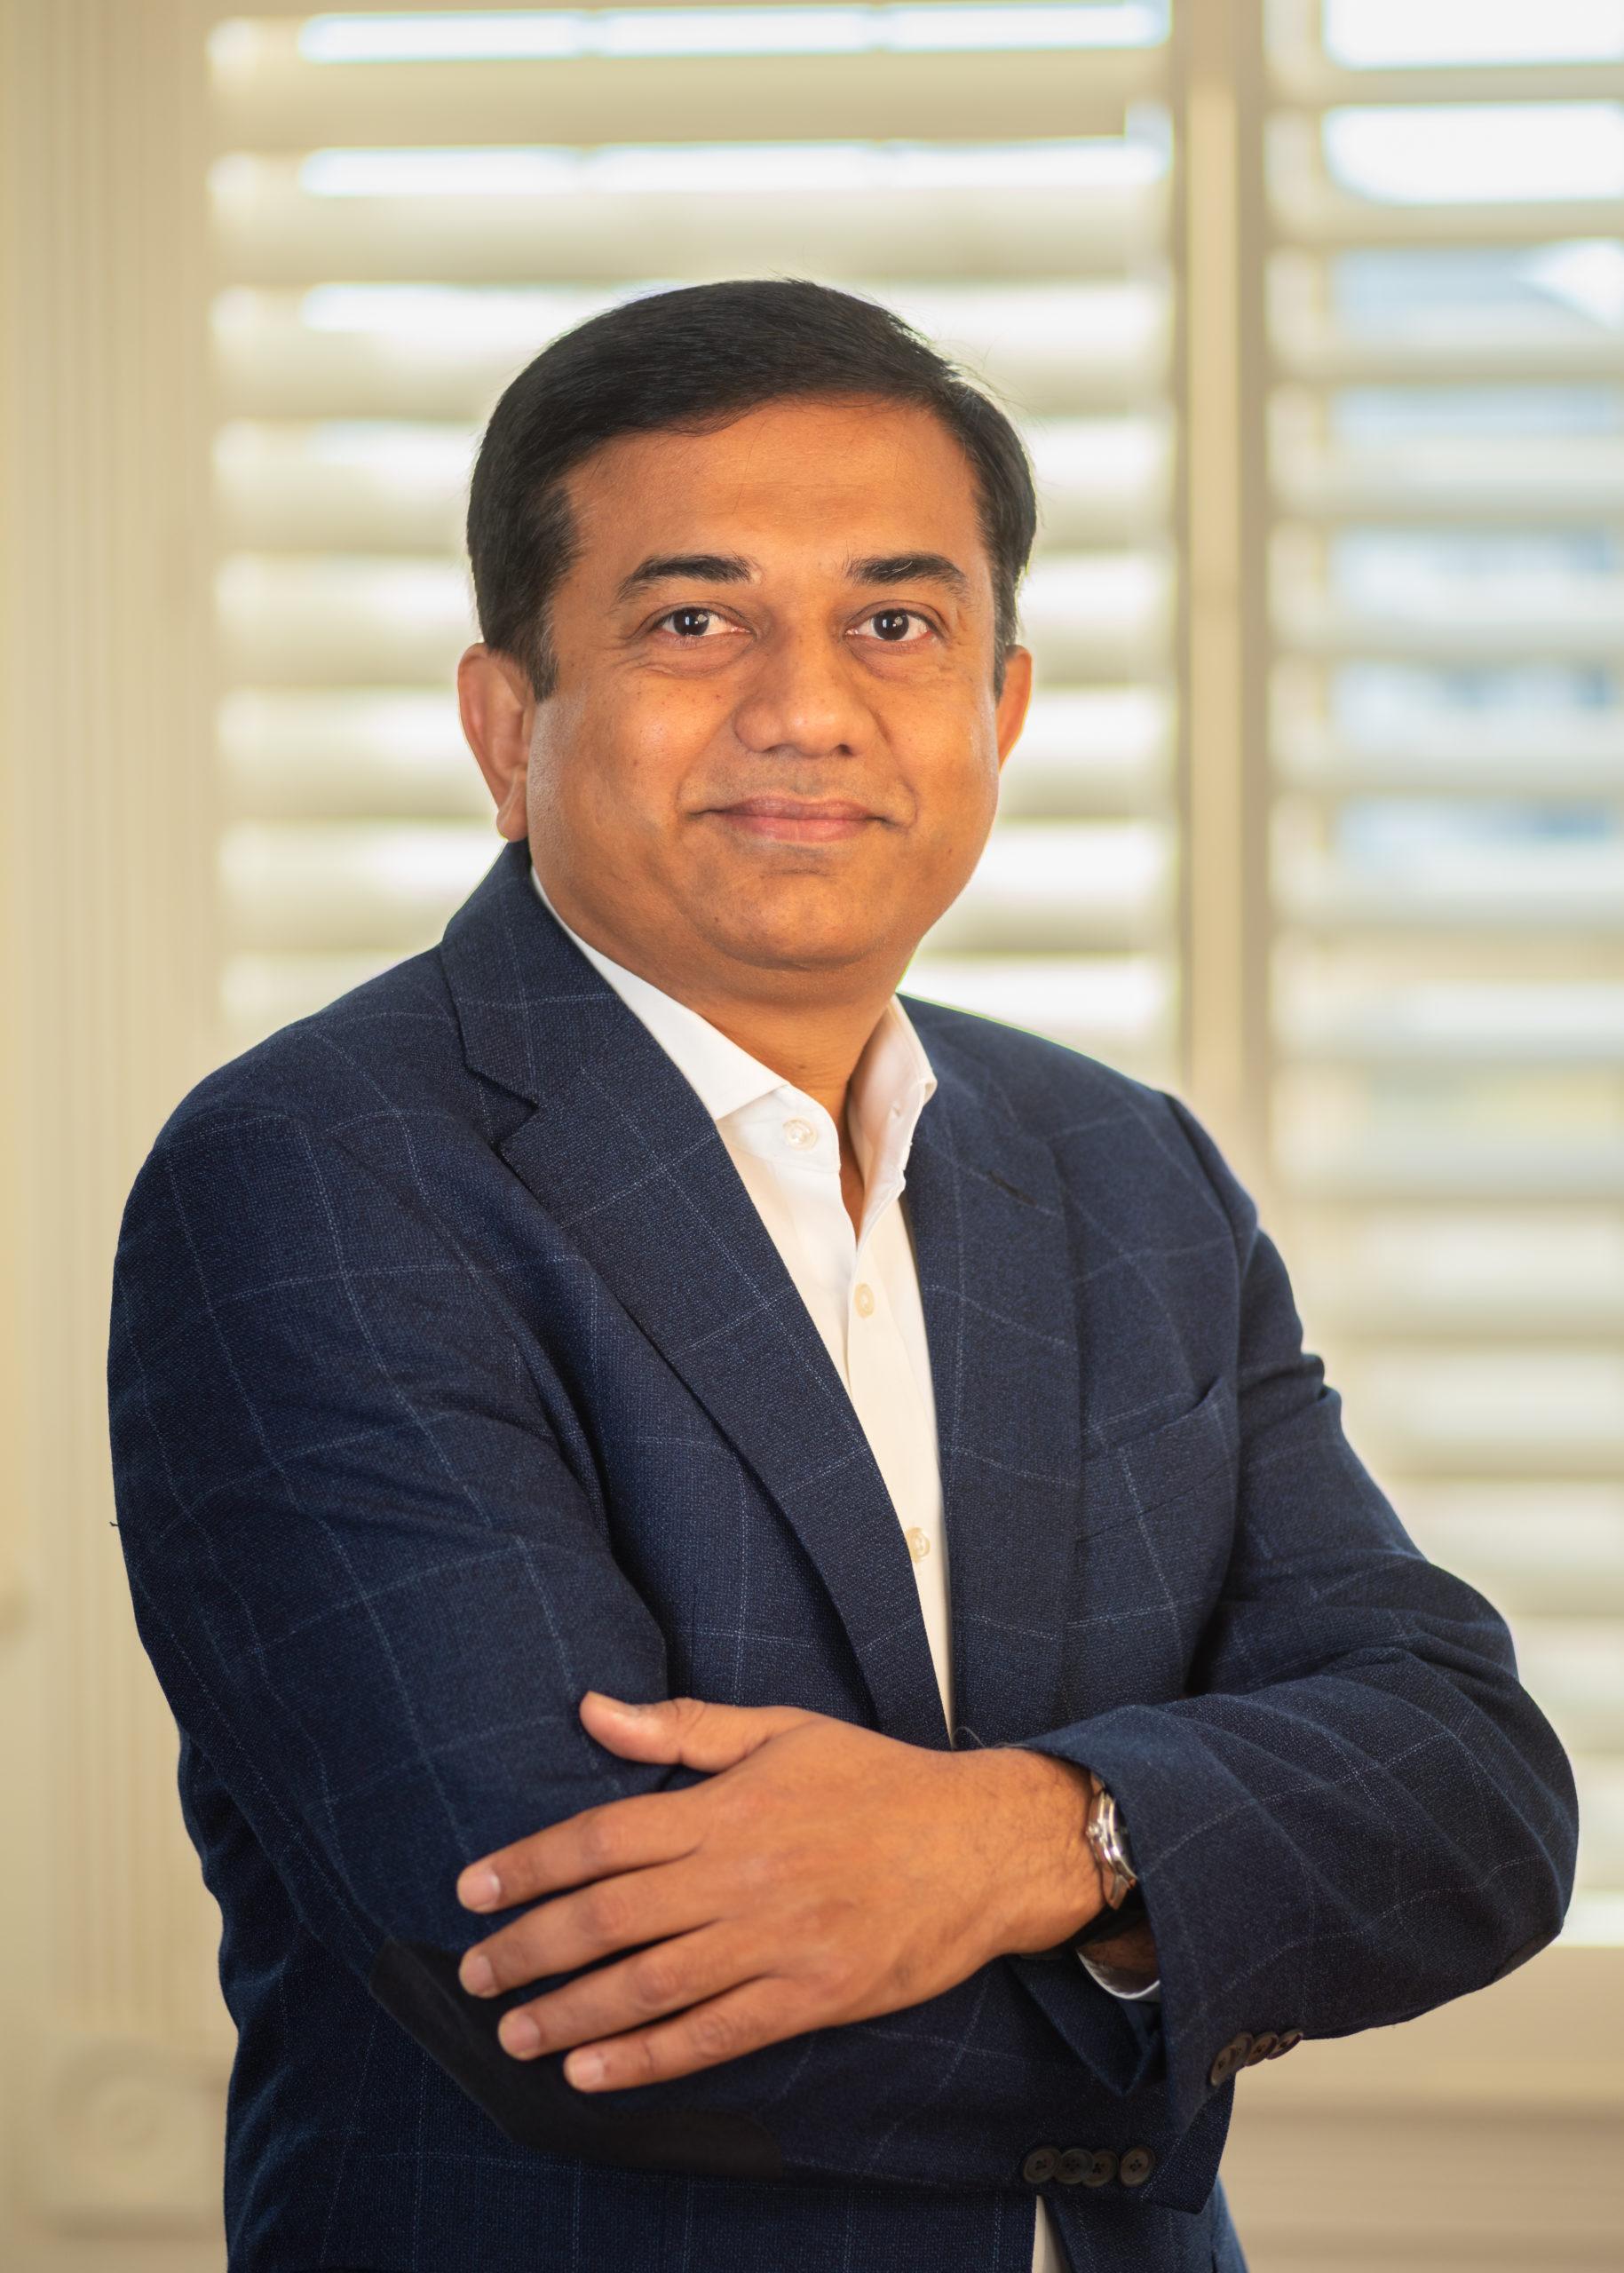 real estate investment, investing, Dipen Patel